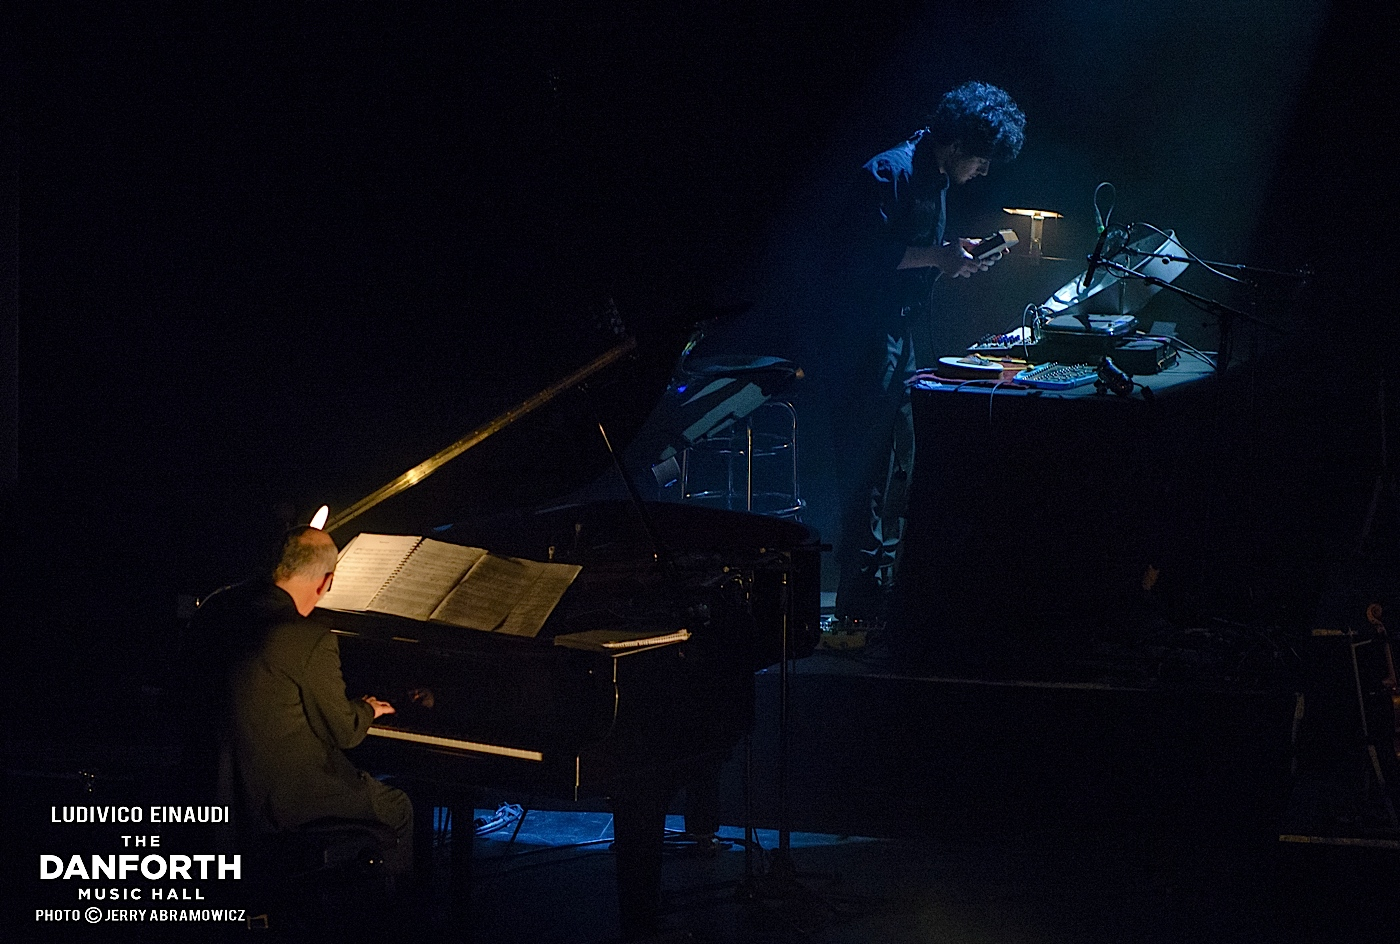 20130517 Ludivico Einaudi performs at The Danforth Music Hall Toronto 0154